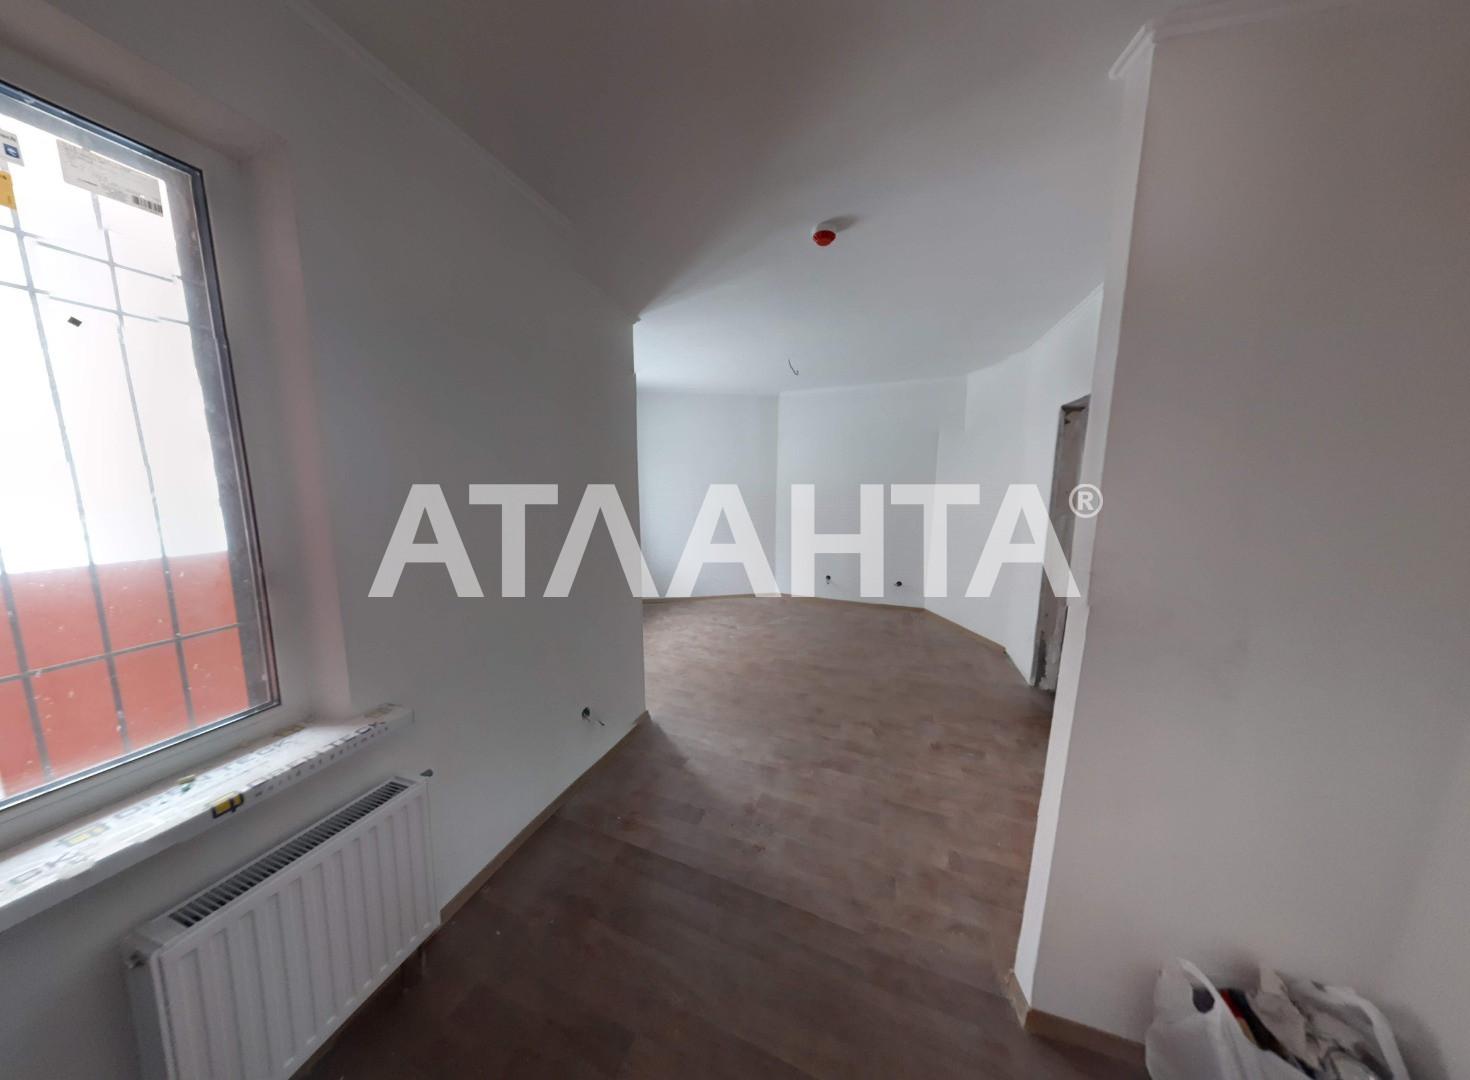 Продается 1-комнатная Квартира на ул. Ул. Ломоносова  — 42 400 у.е. (фото №2)